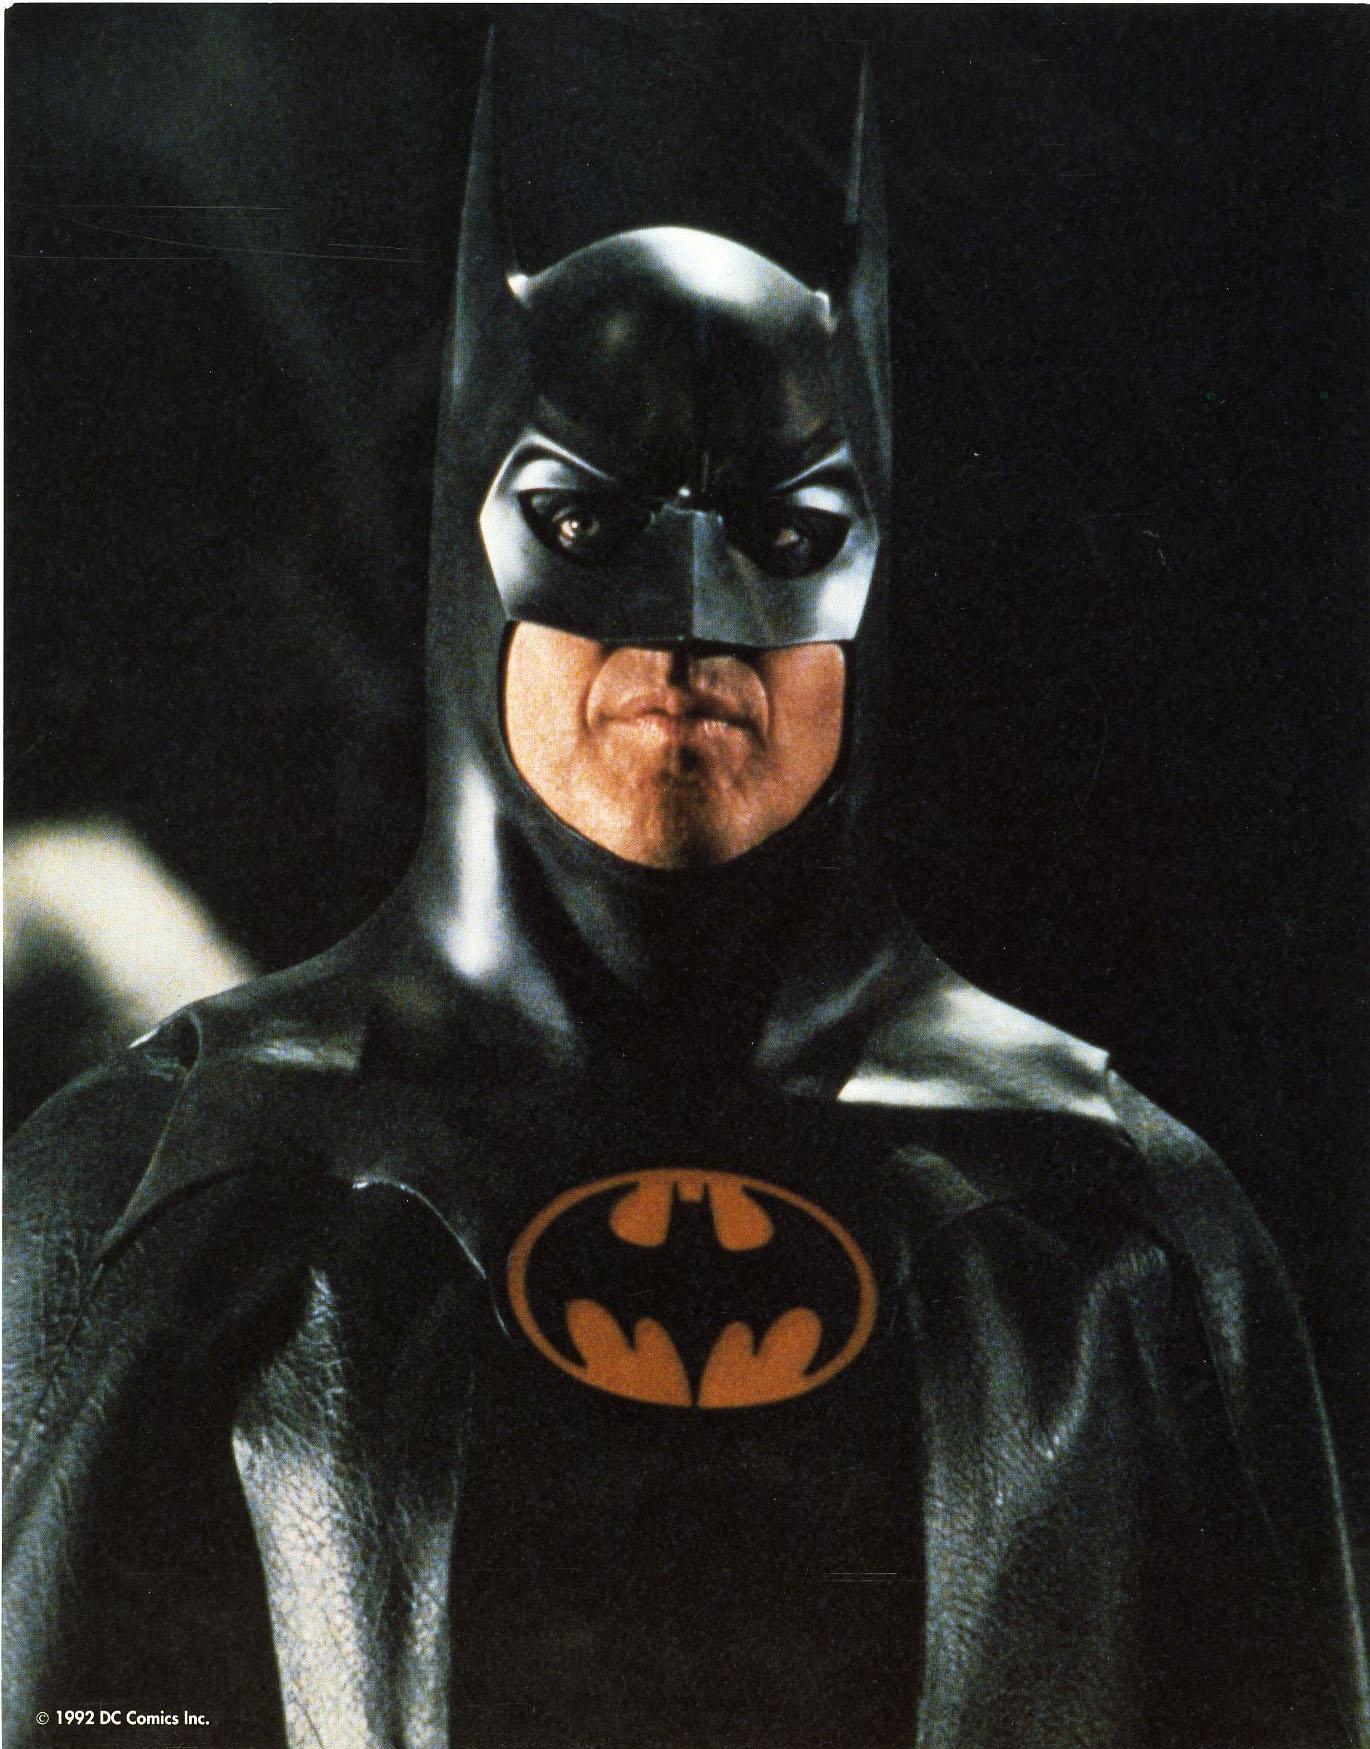 Batman (1989) - Extras